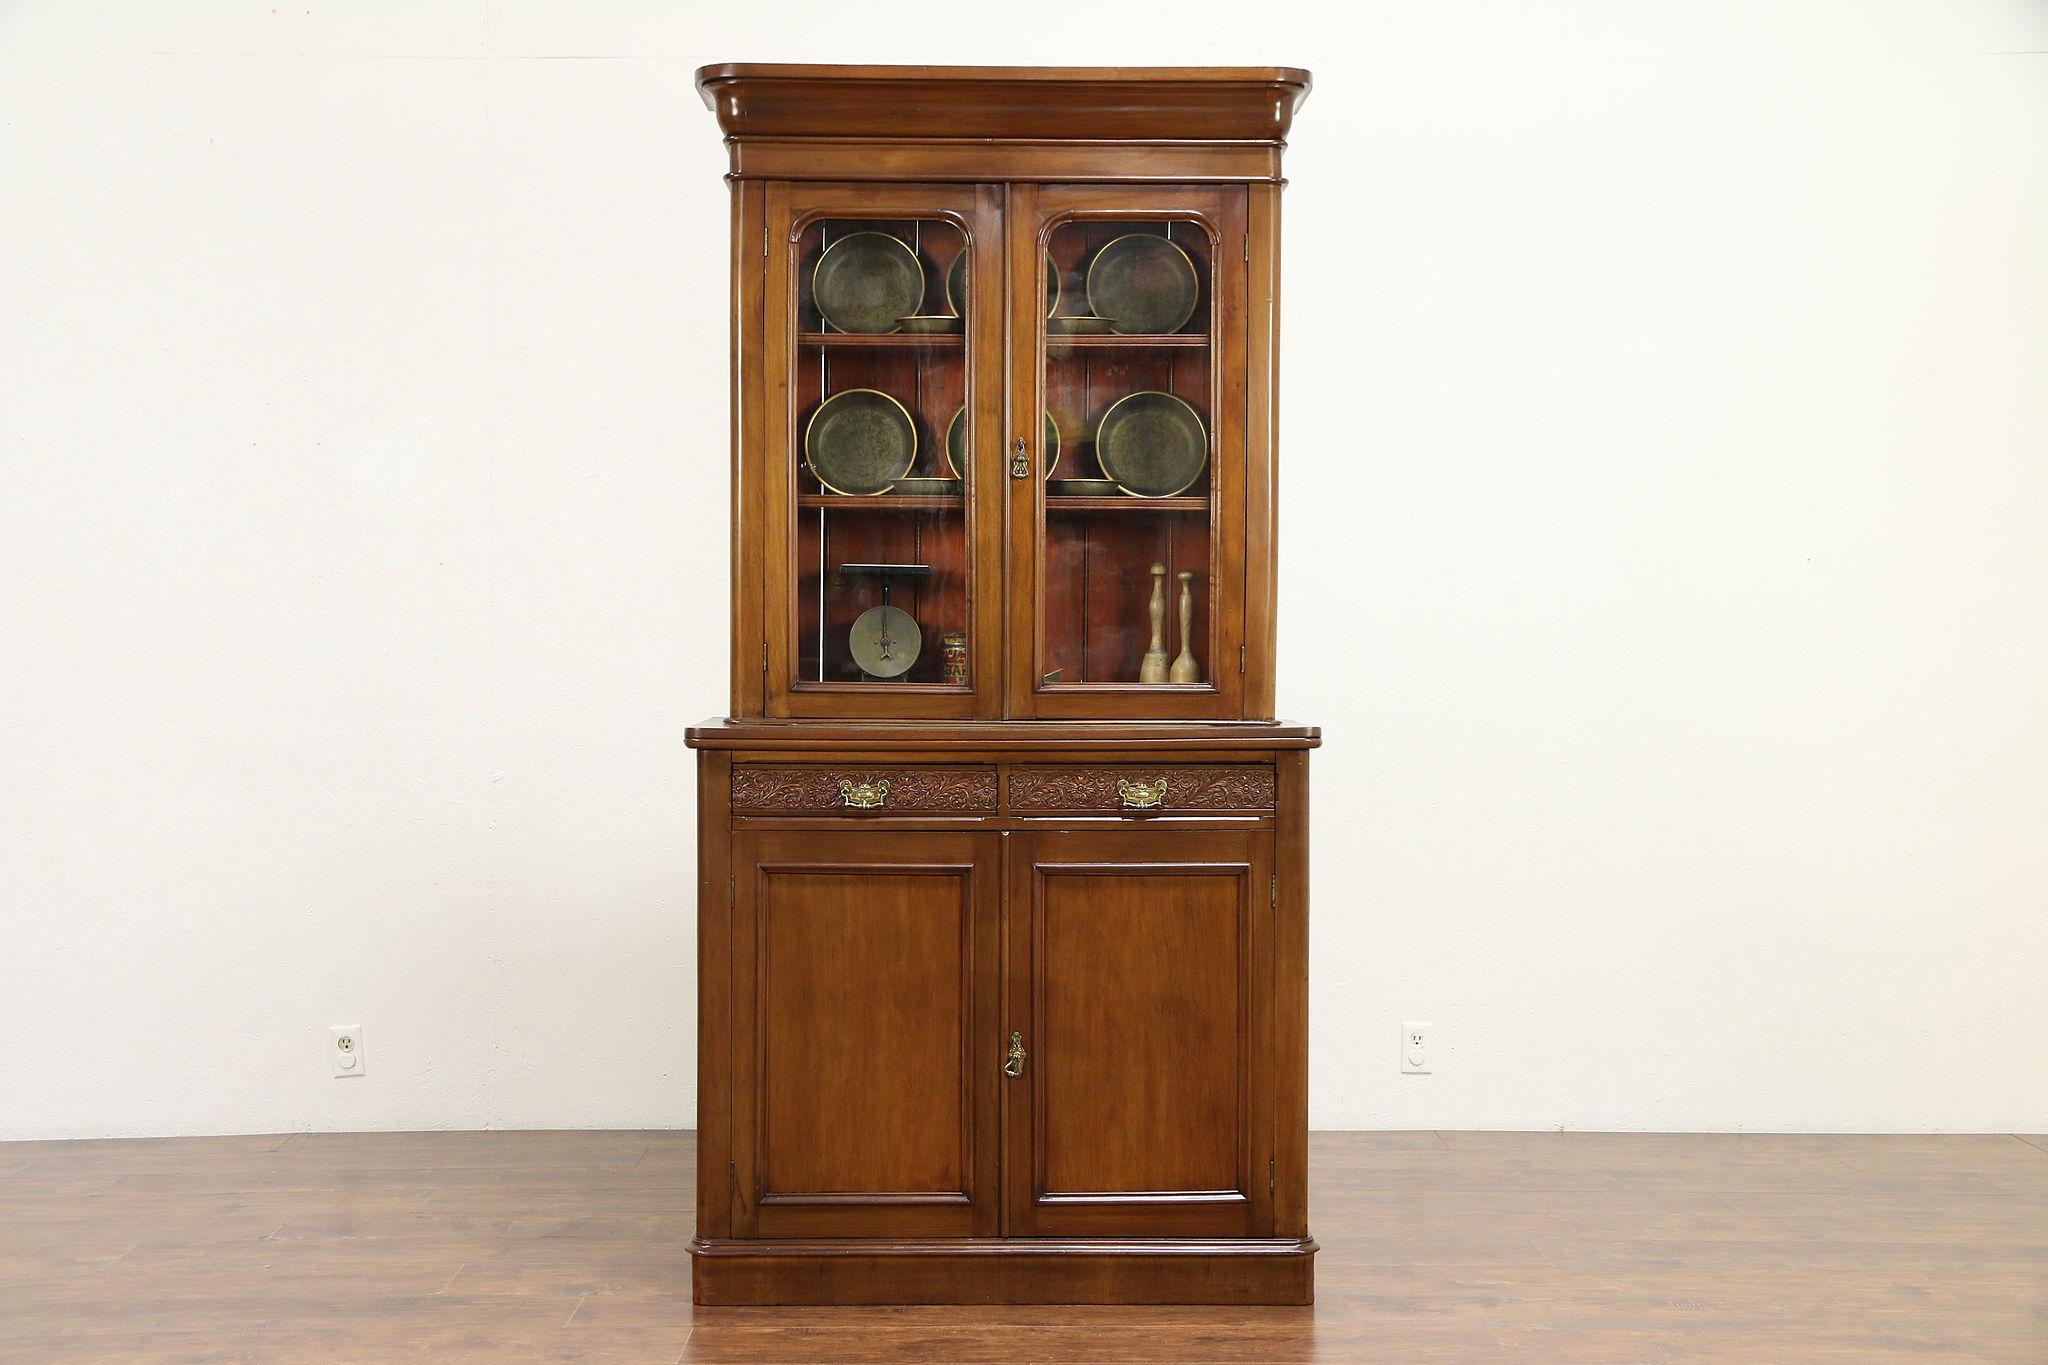 Victorian English Antique Mahogany Bookcase Cabinet Wavy Glass Doors 30488